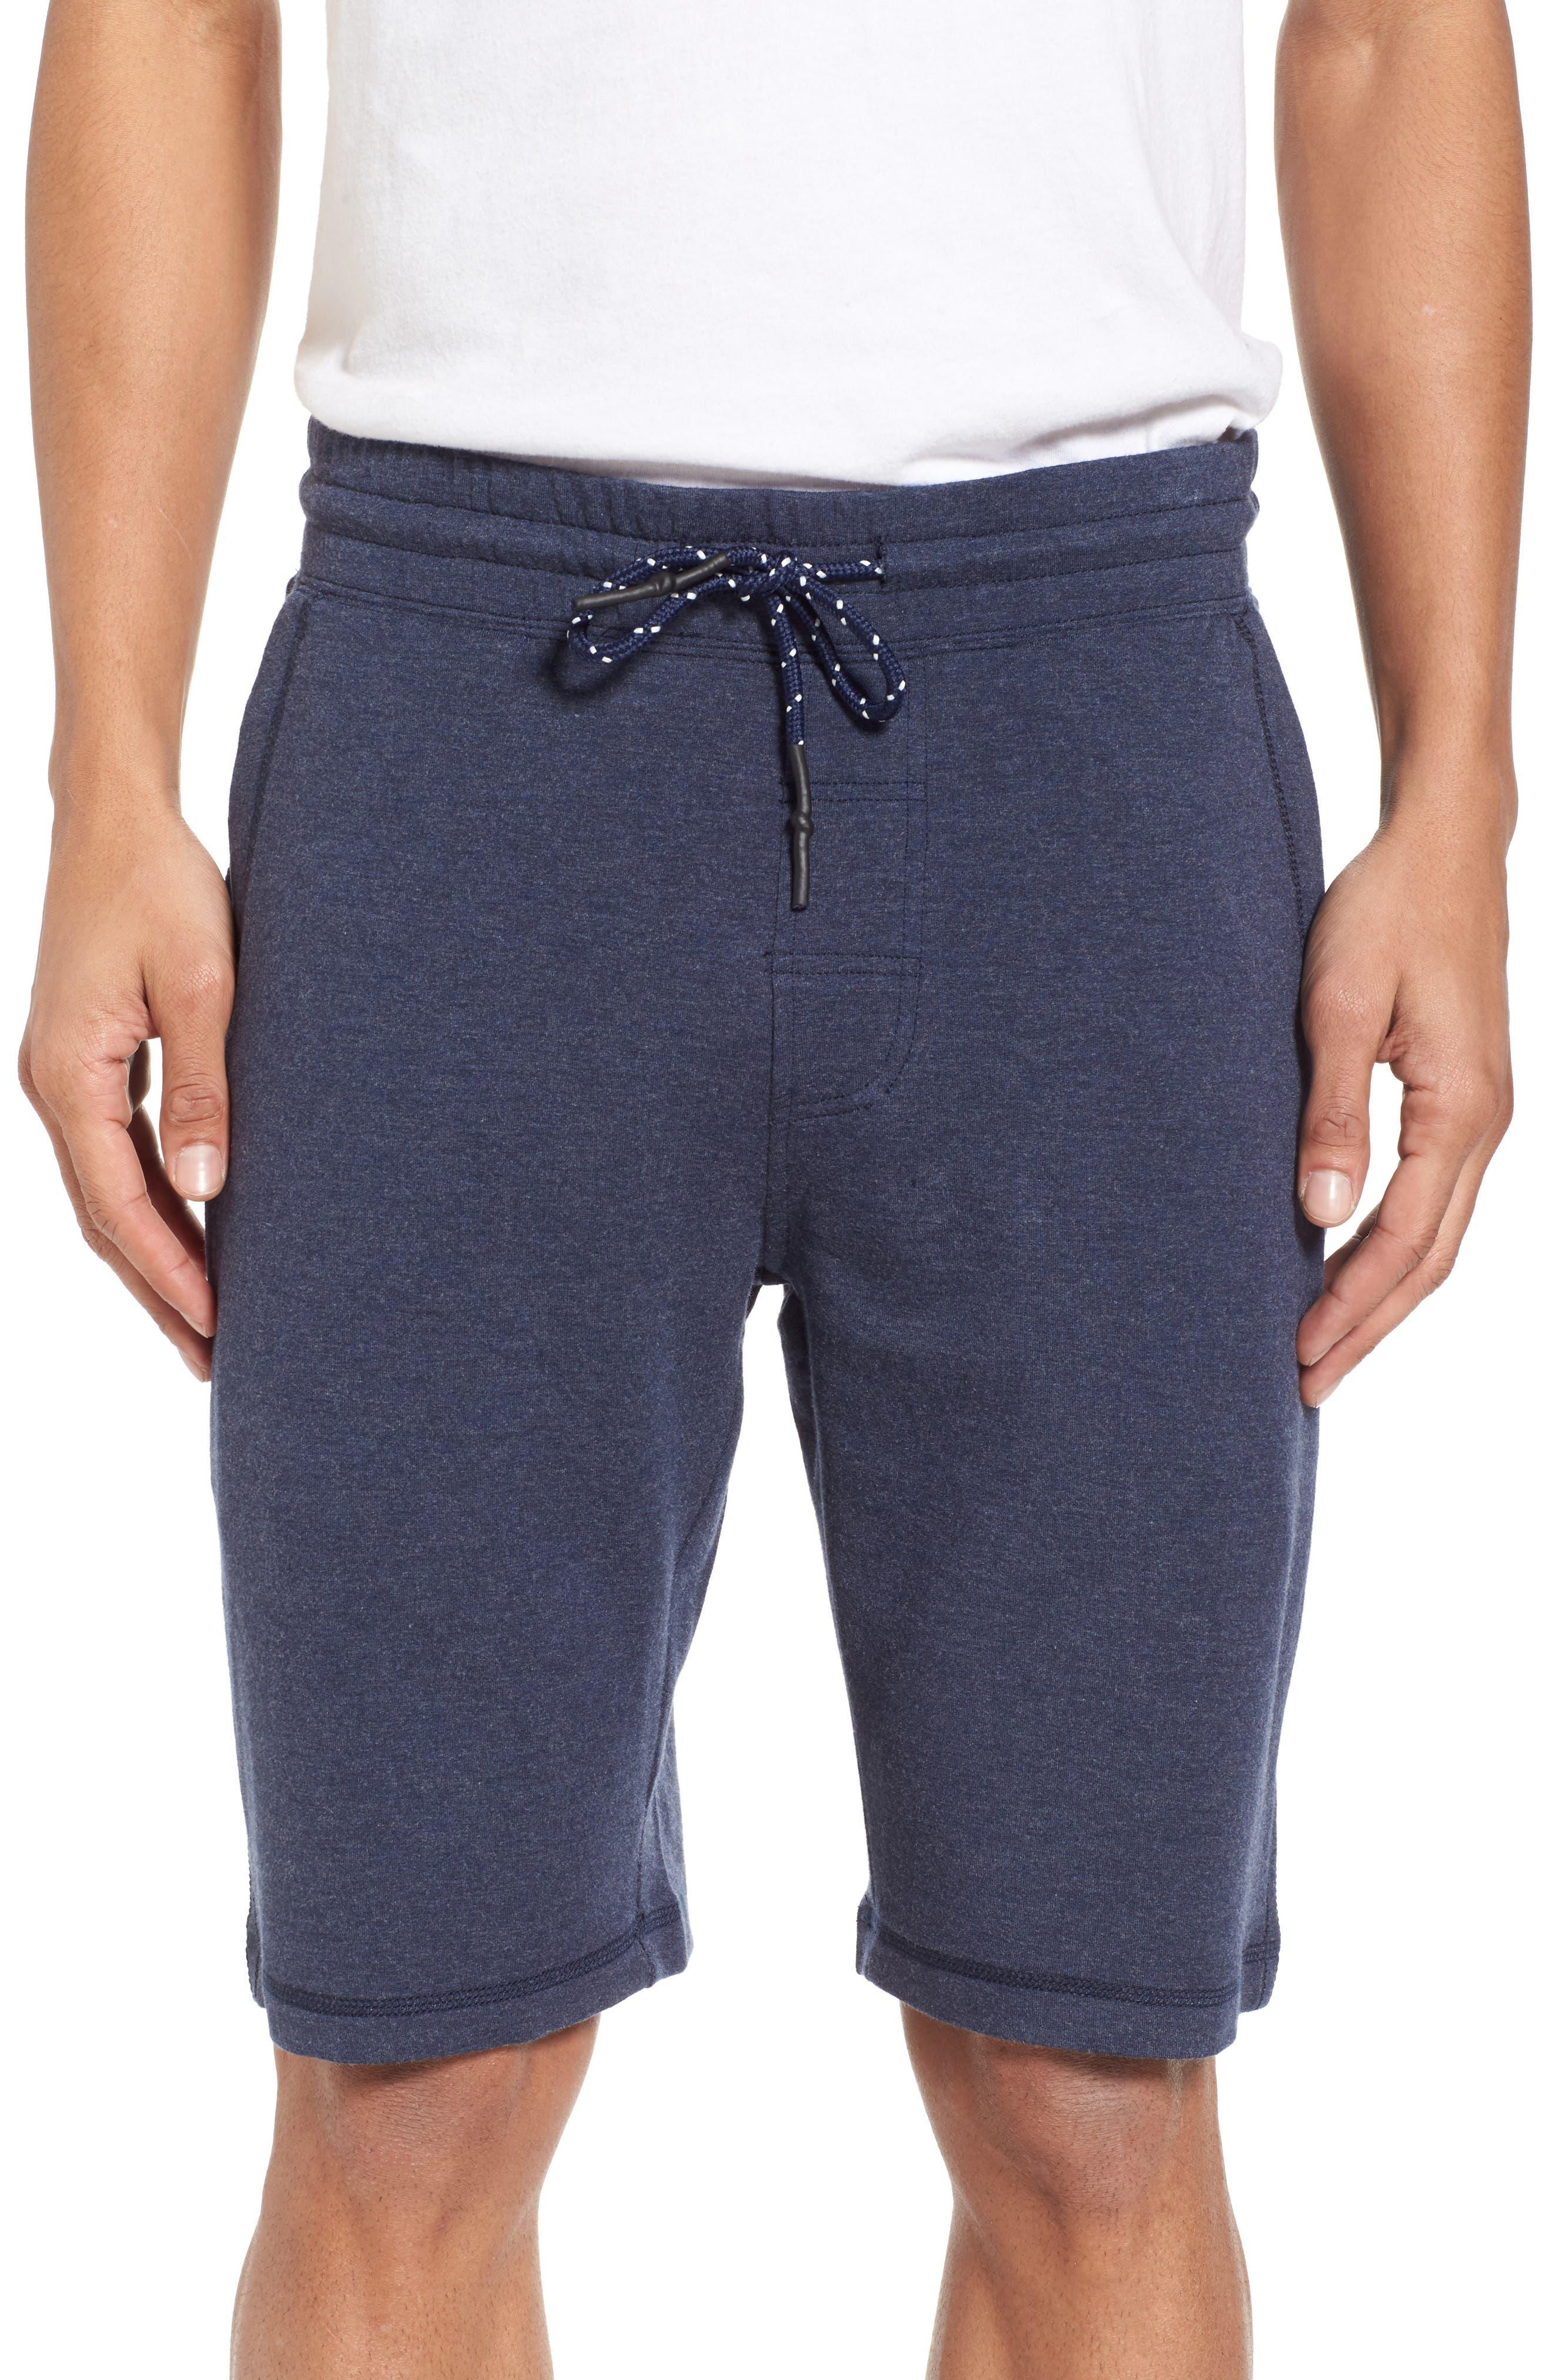 Brushback Fleece Shorts,                             Main thumbnail 1, color,                             Navy Heather